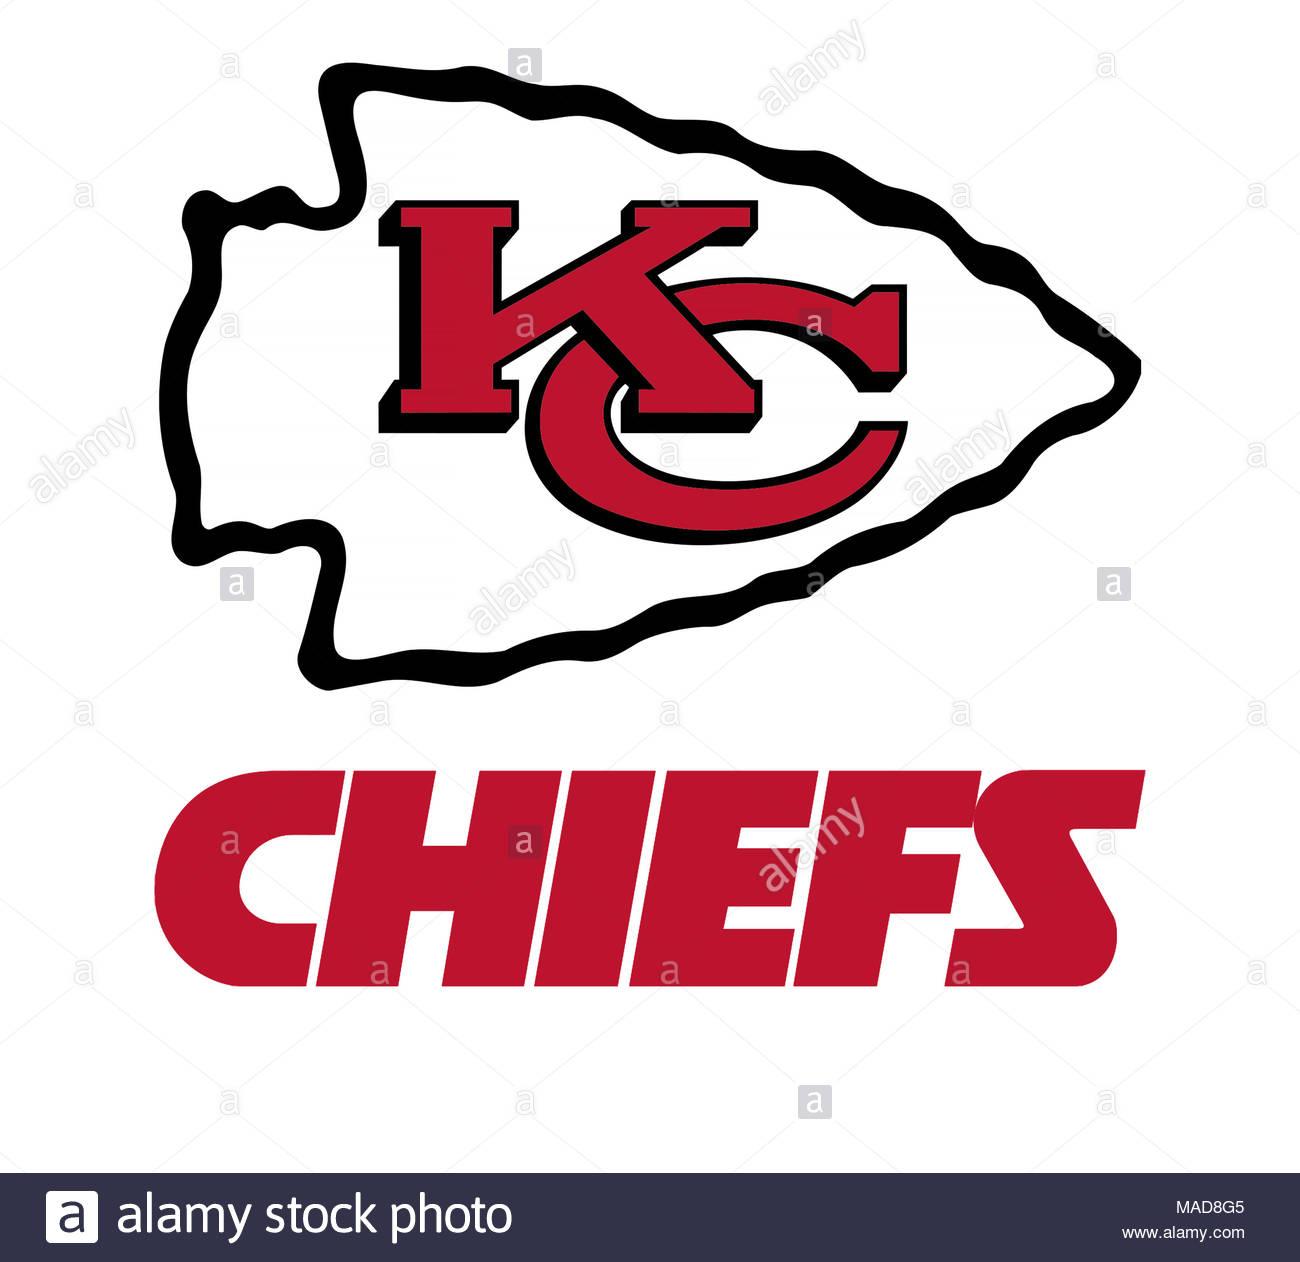 Kansas City Chiefs logo icon - Stock Image